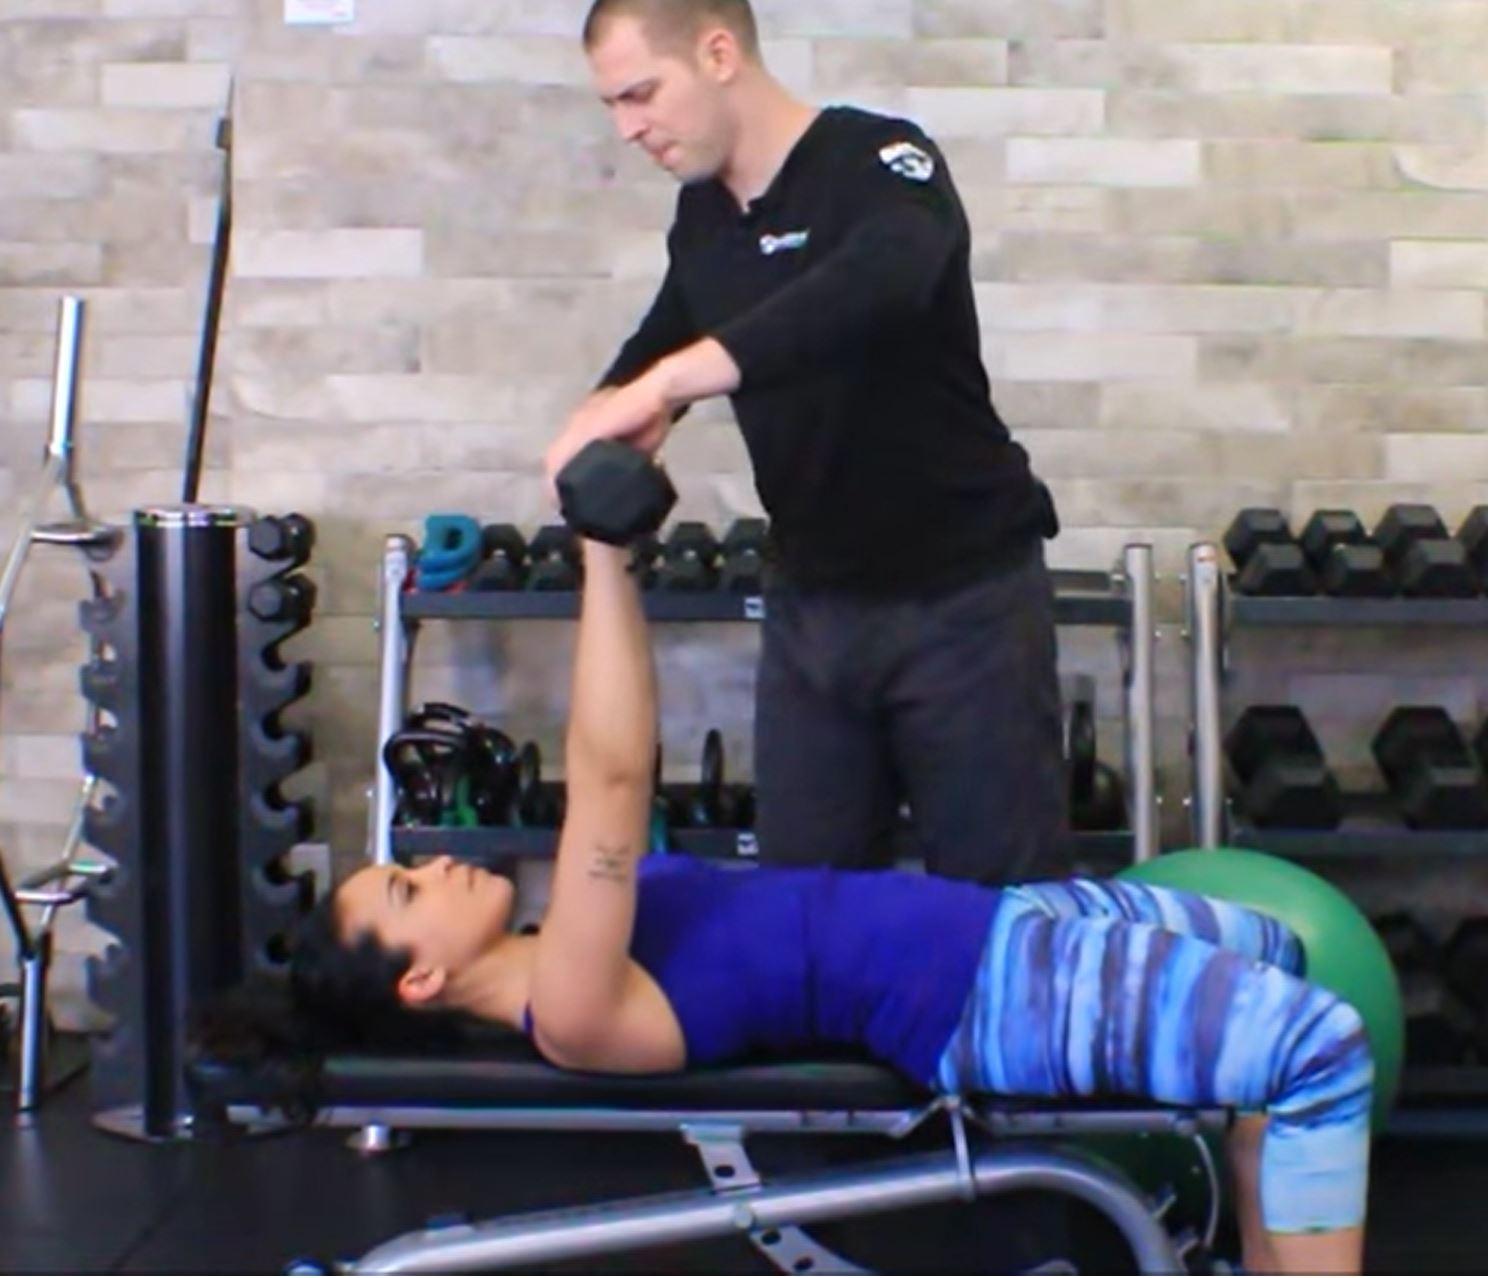 Dr. Brent Brookbush cues Melissa through multi-planer dumbbell press on bench